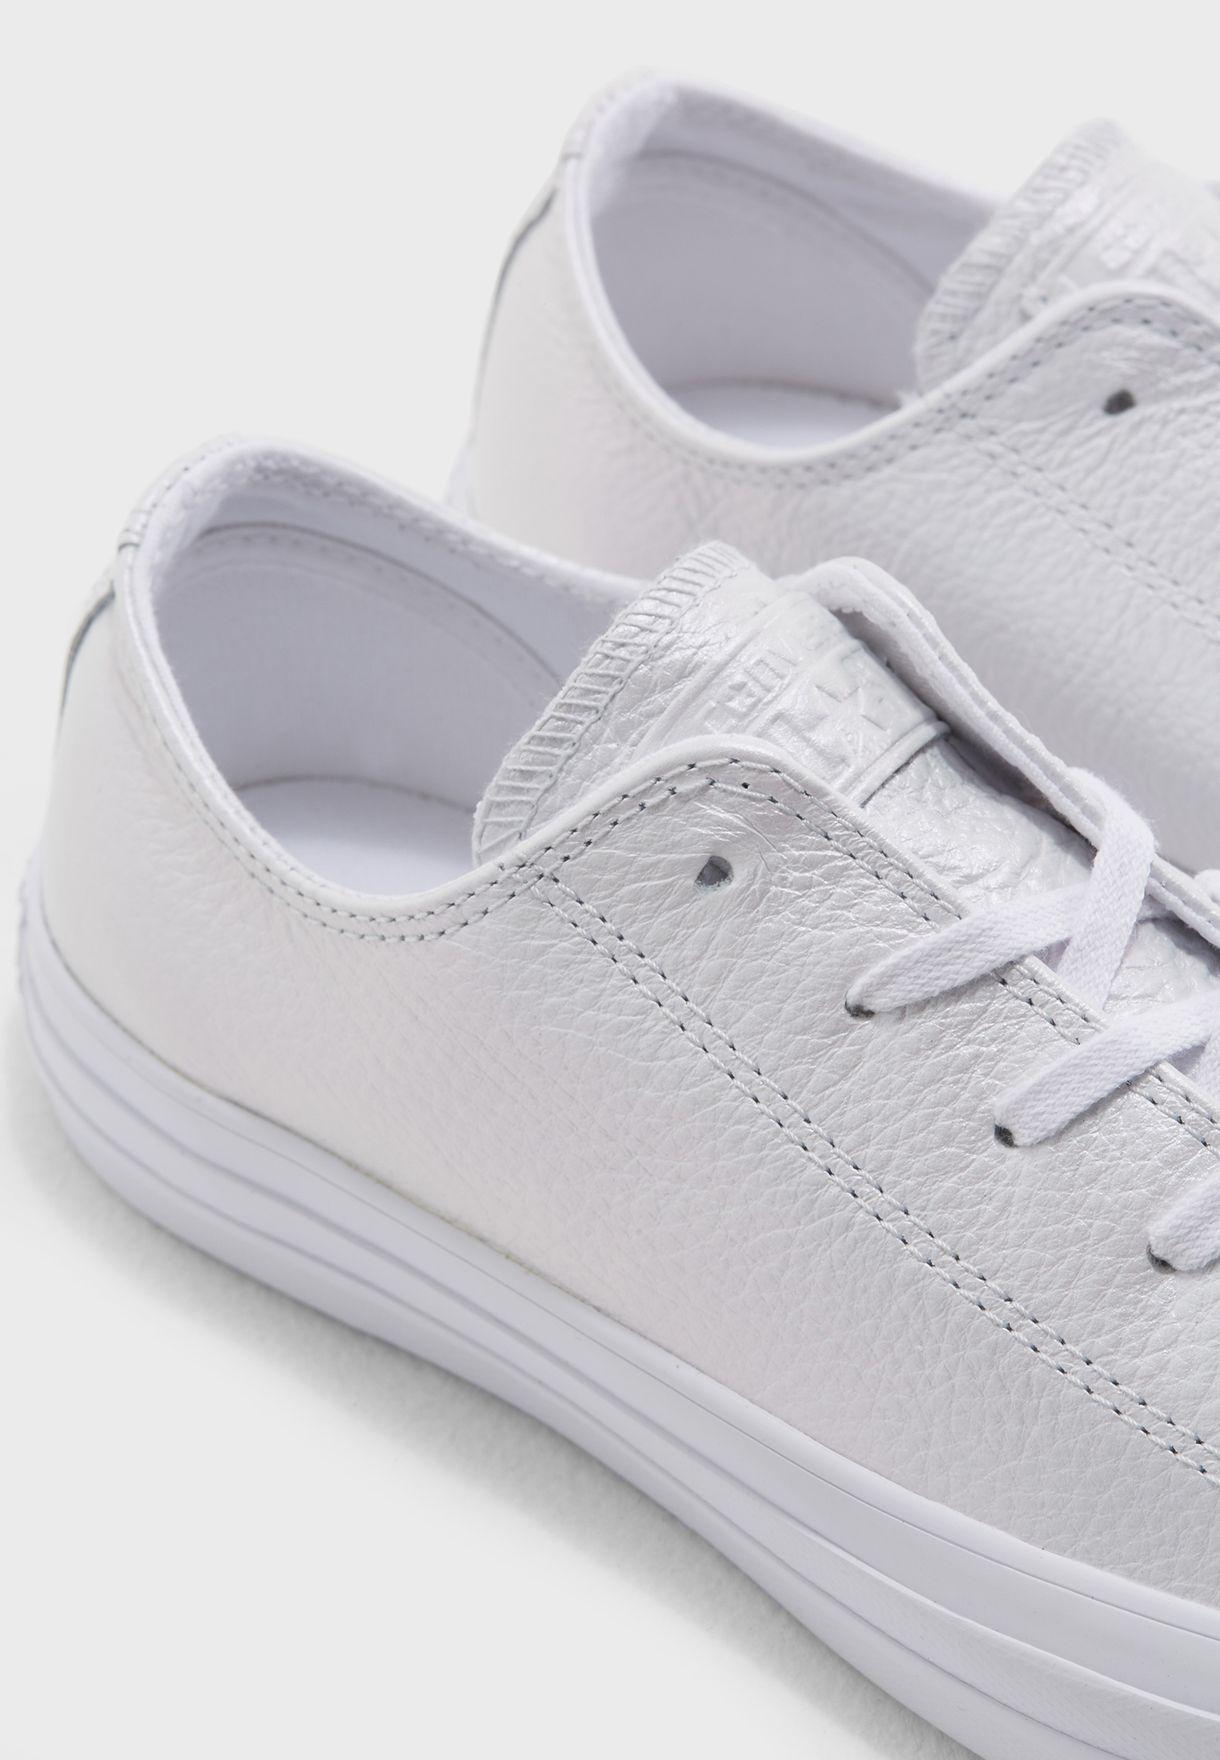 حذاء سي تي ايه اس: اريدسنت ليذر